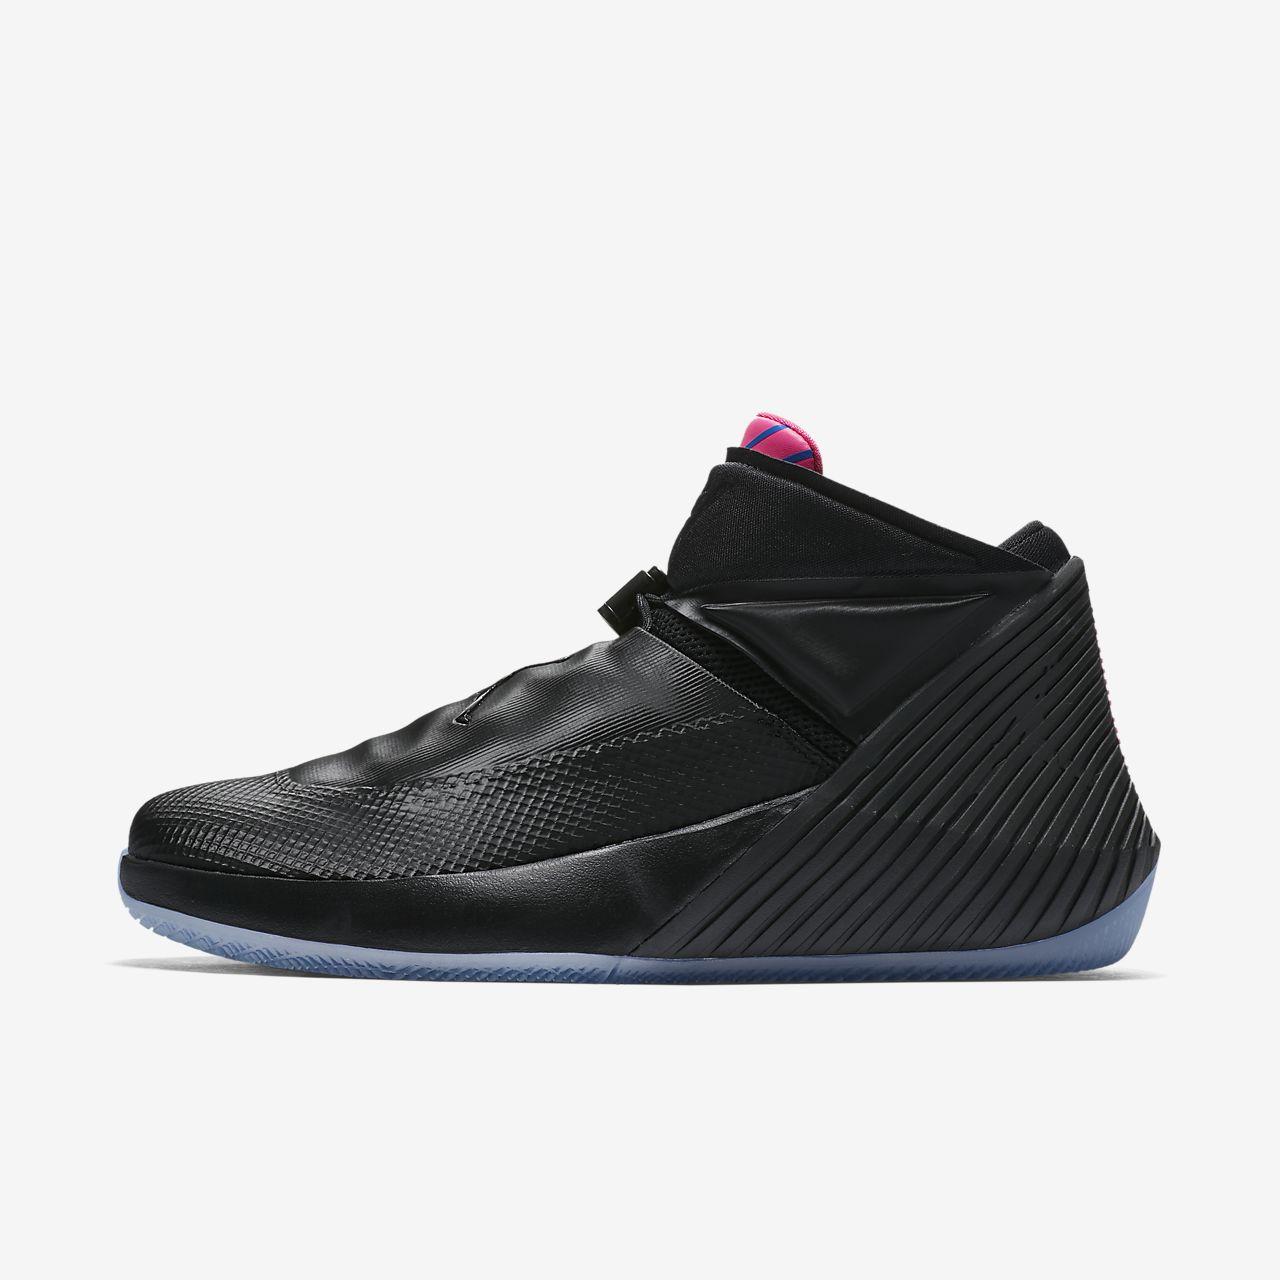 Jordan B Fly Men Shoes